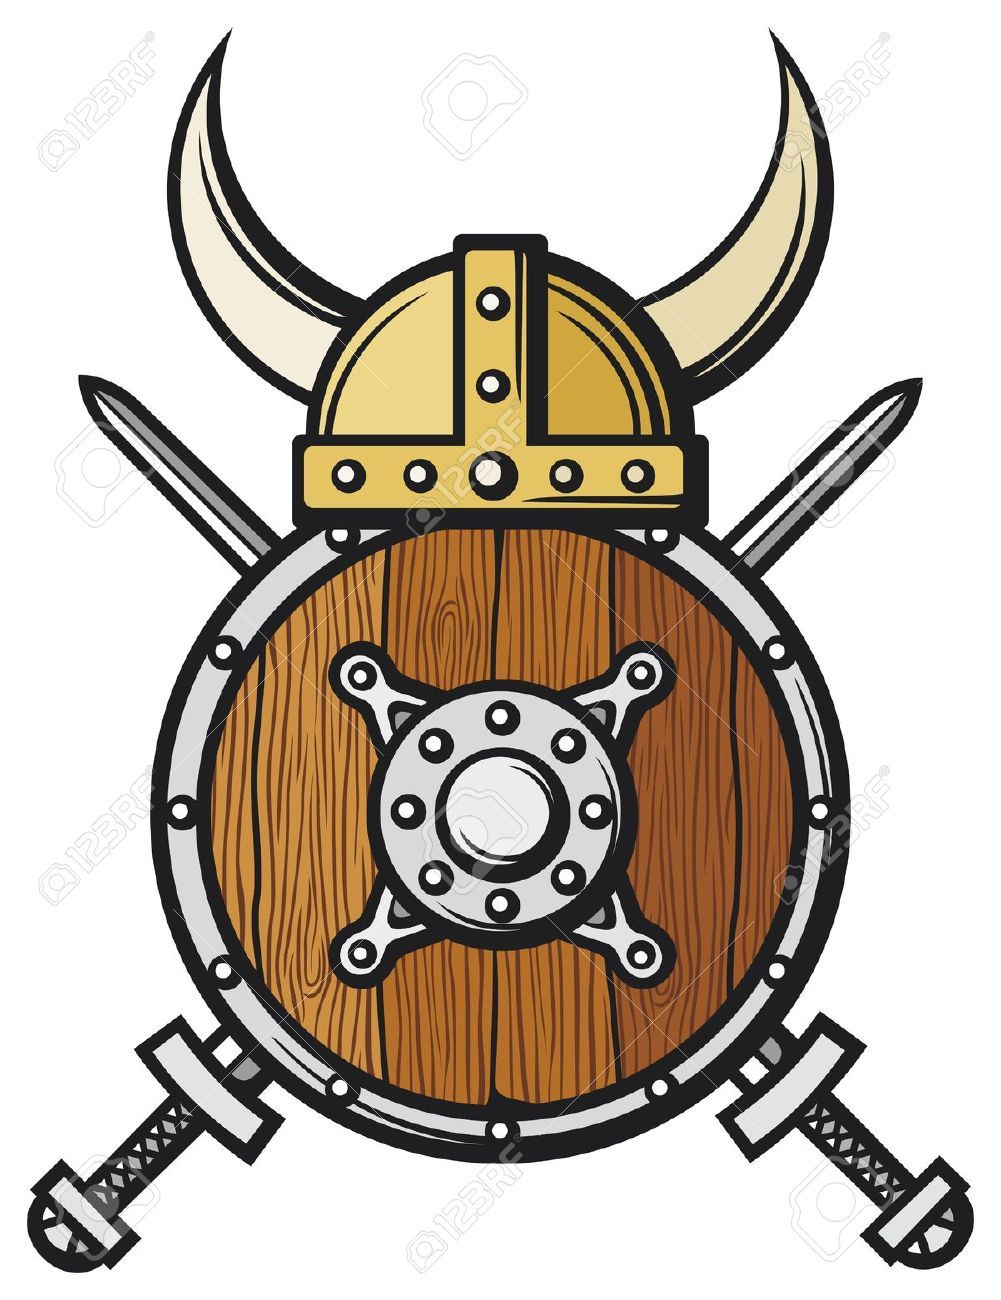 Vikingo Buscar Vikingos Escudo GoogleProyecto Con Casco LGzVUMpqSj